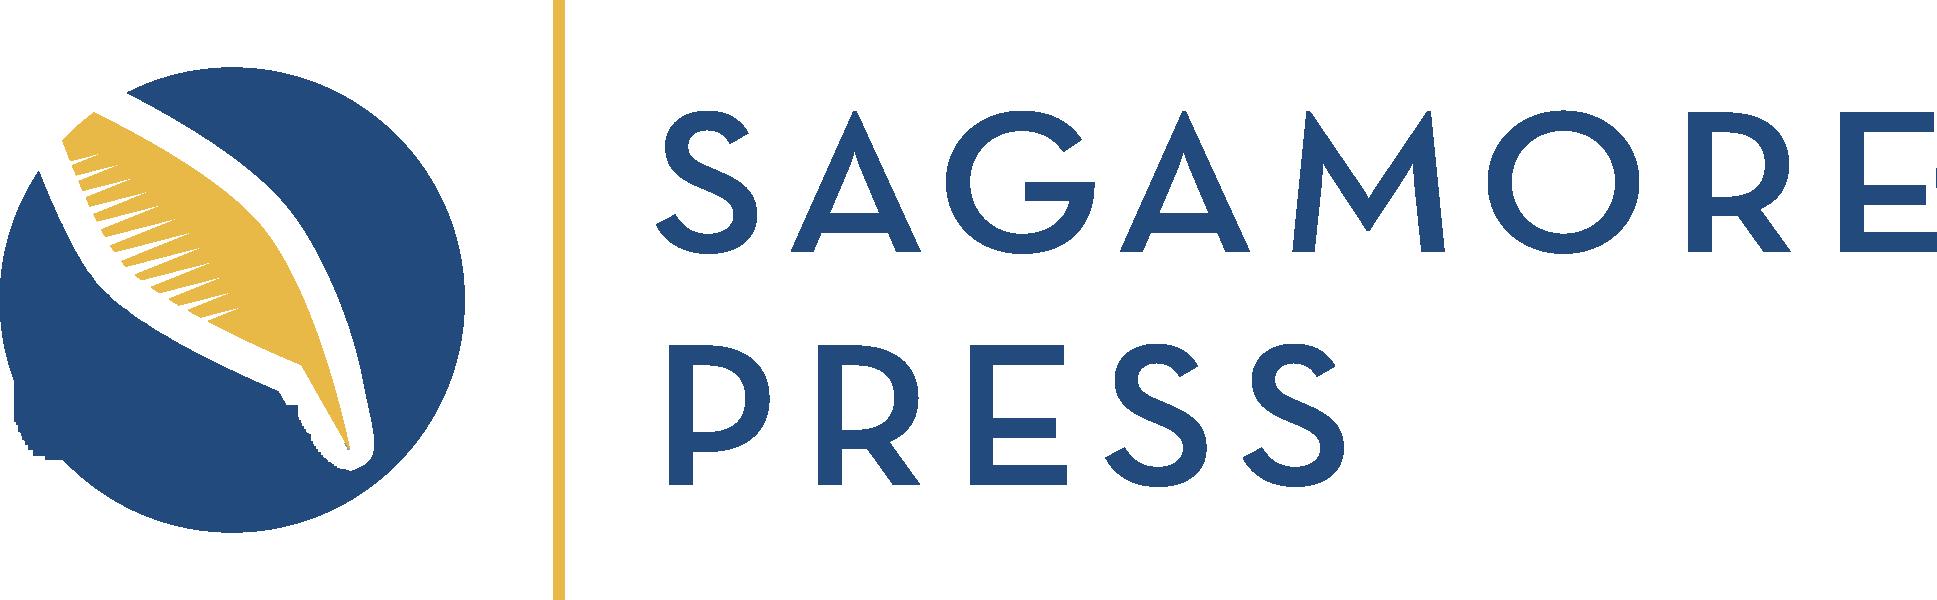 Sagamore-Press-Logo-5